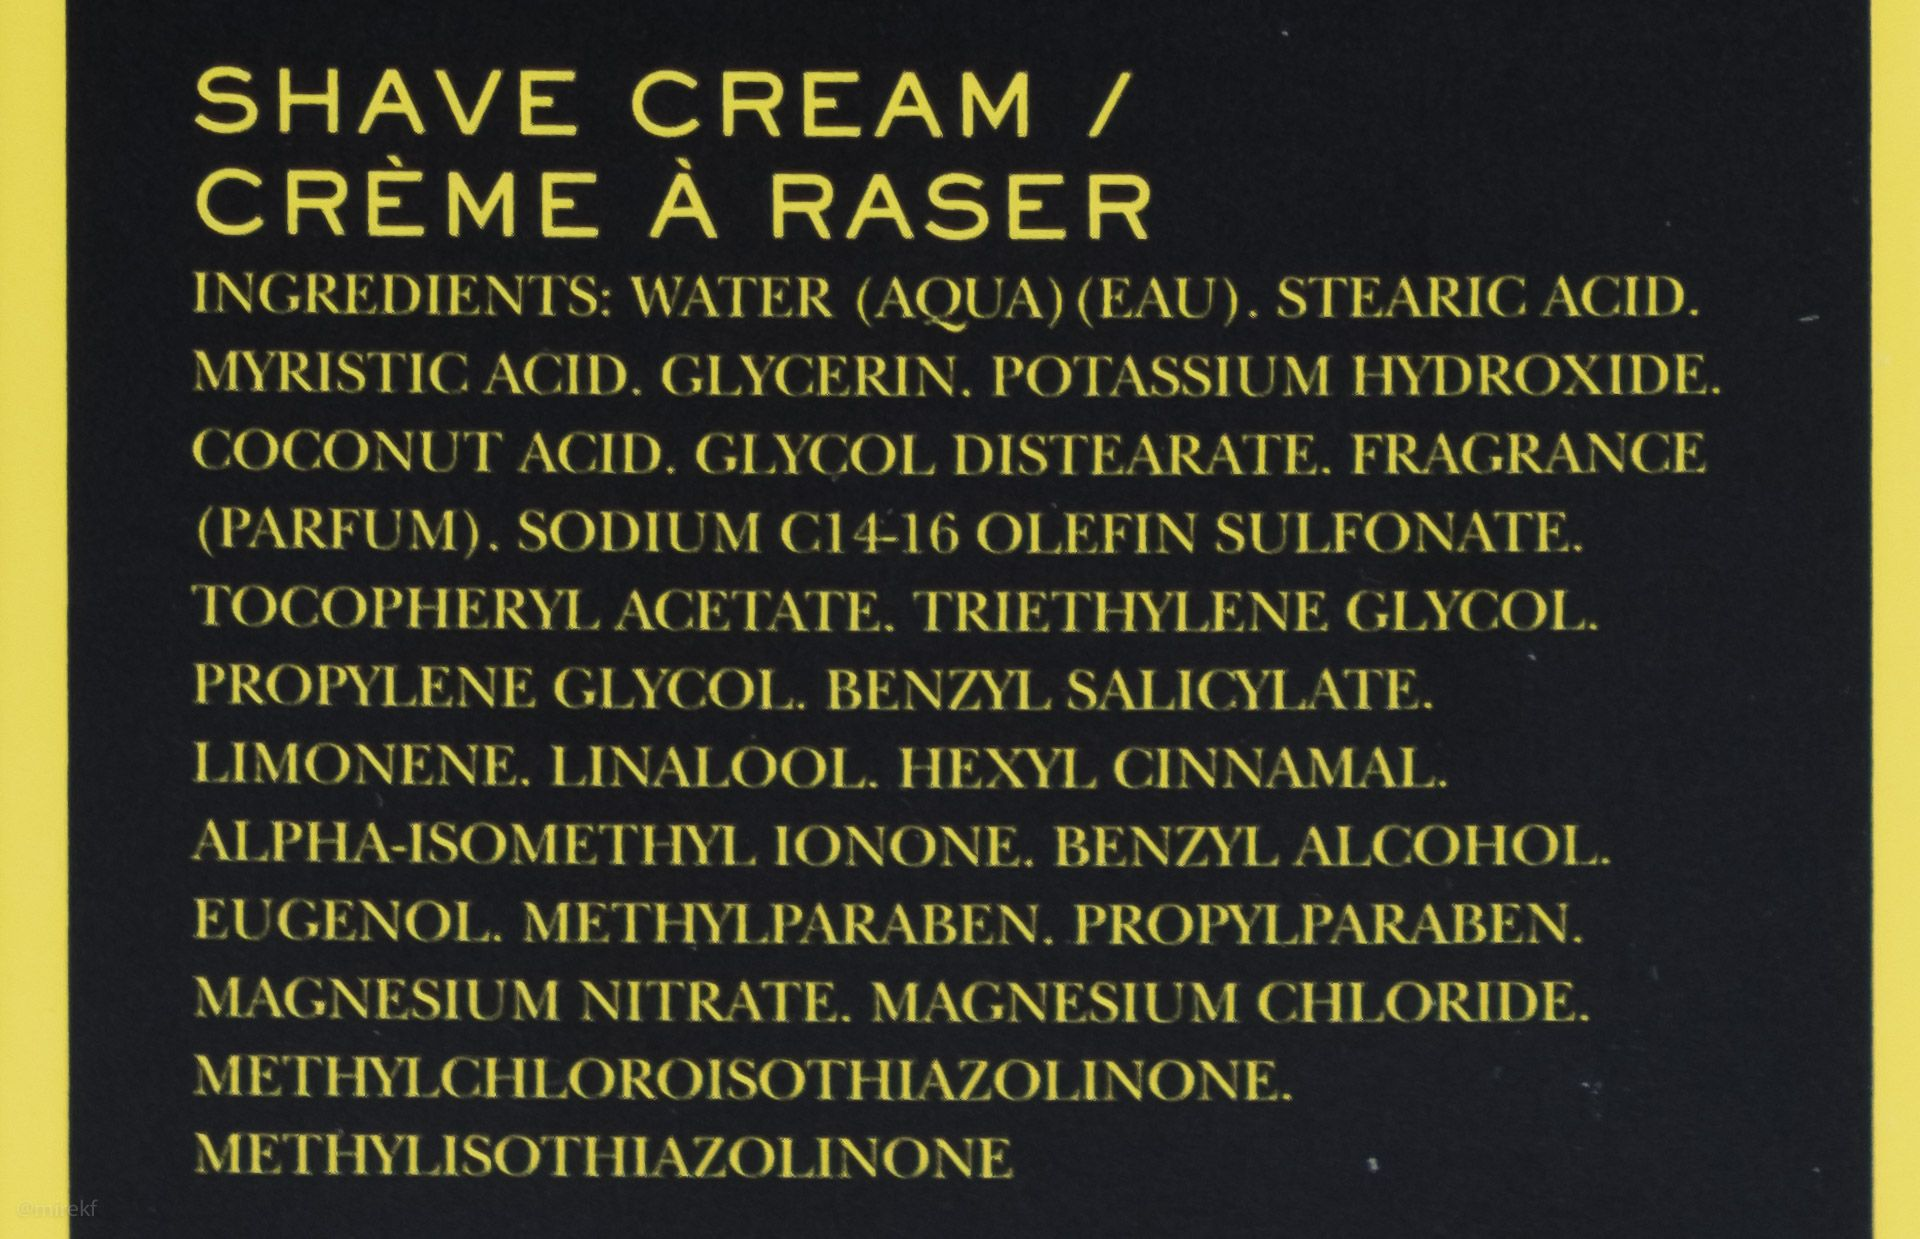 Skład (INCI ingredients) Crabtree & Evelyn West Indian Lime Shaving Cream